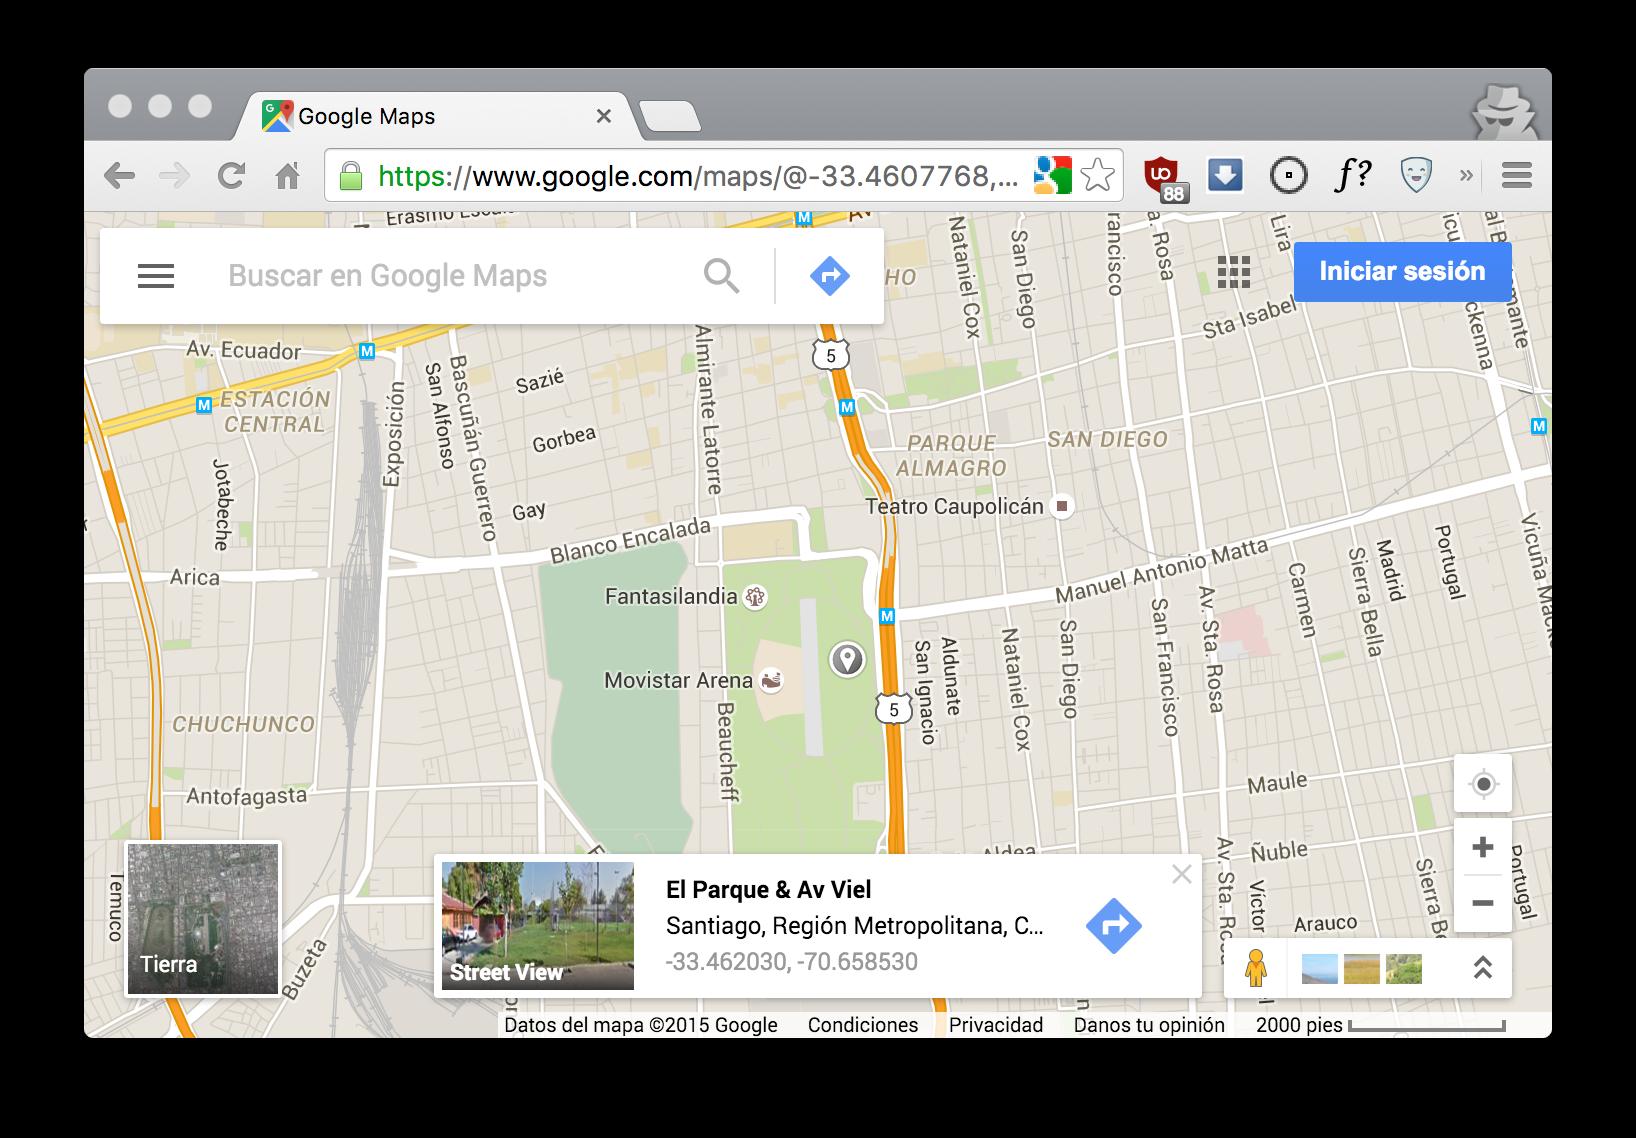 Get GoogleMaps com coordinates to clipboard on click · Patricio López J